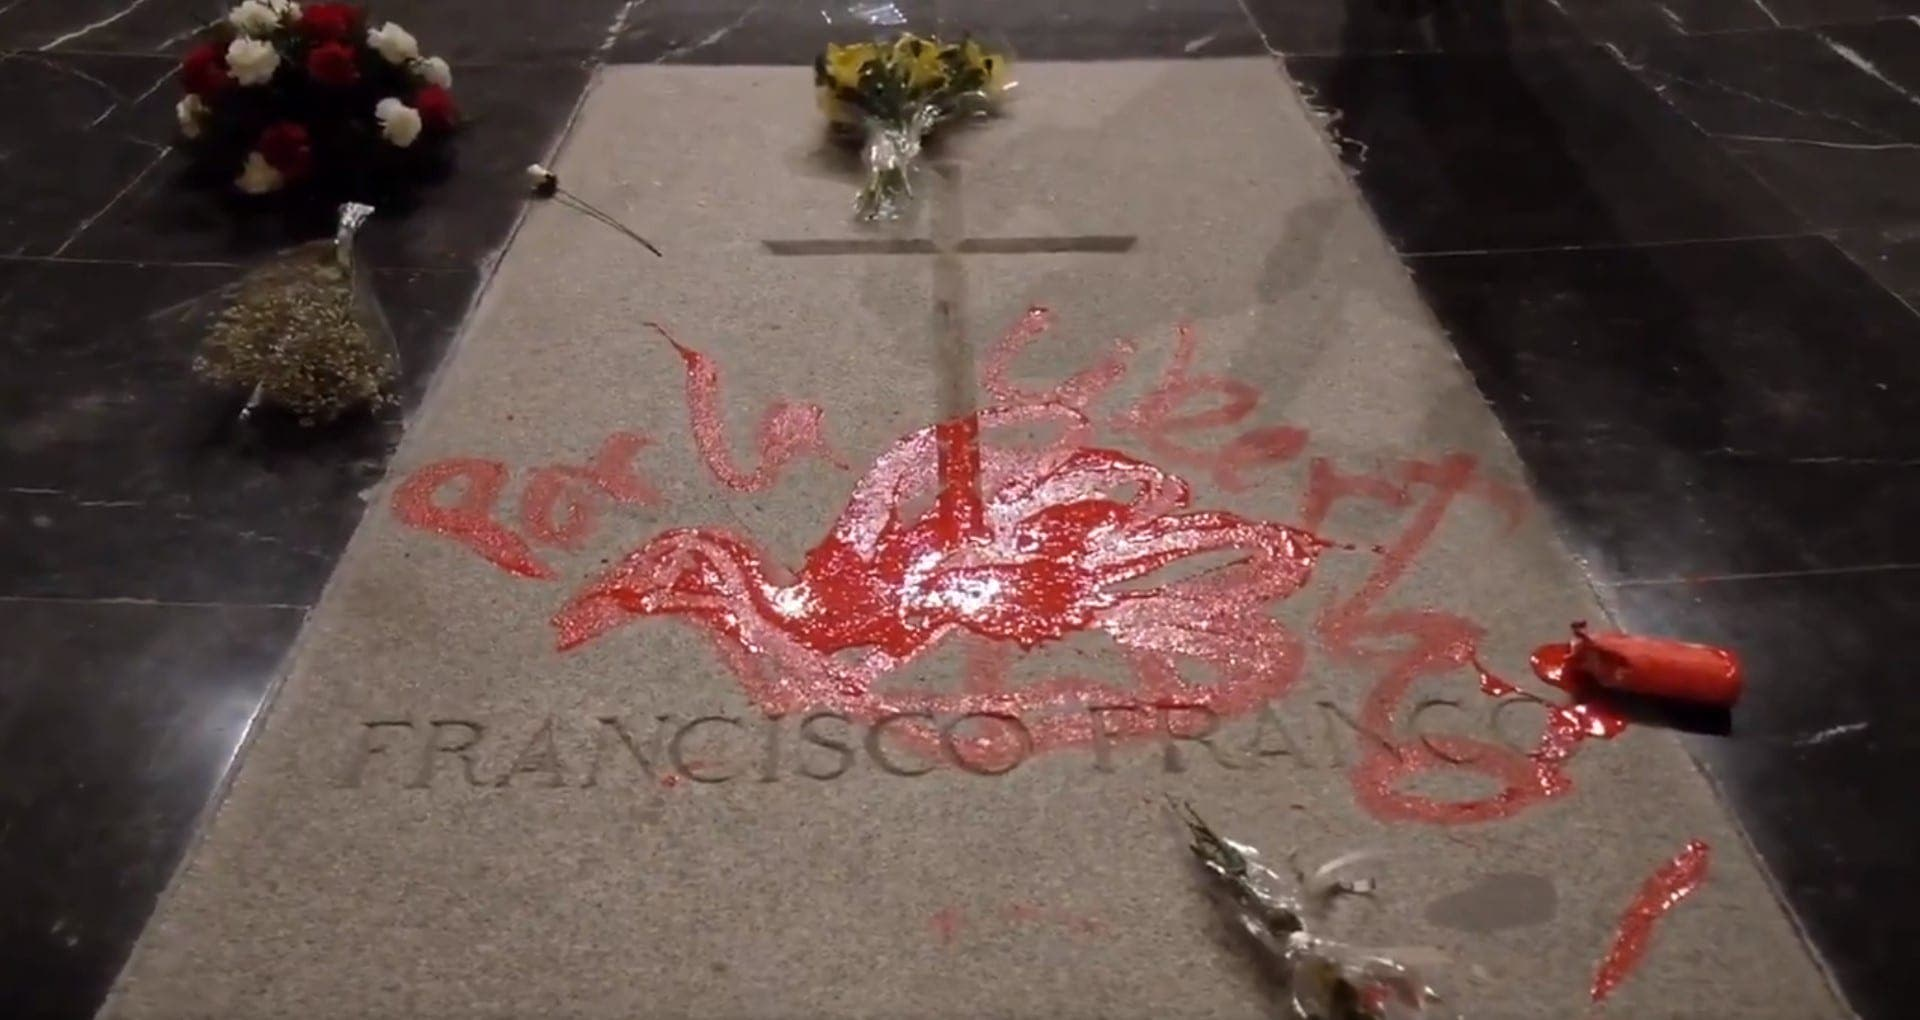 Franco grave defaced